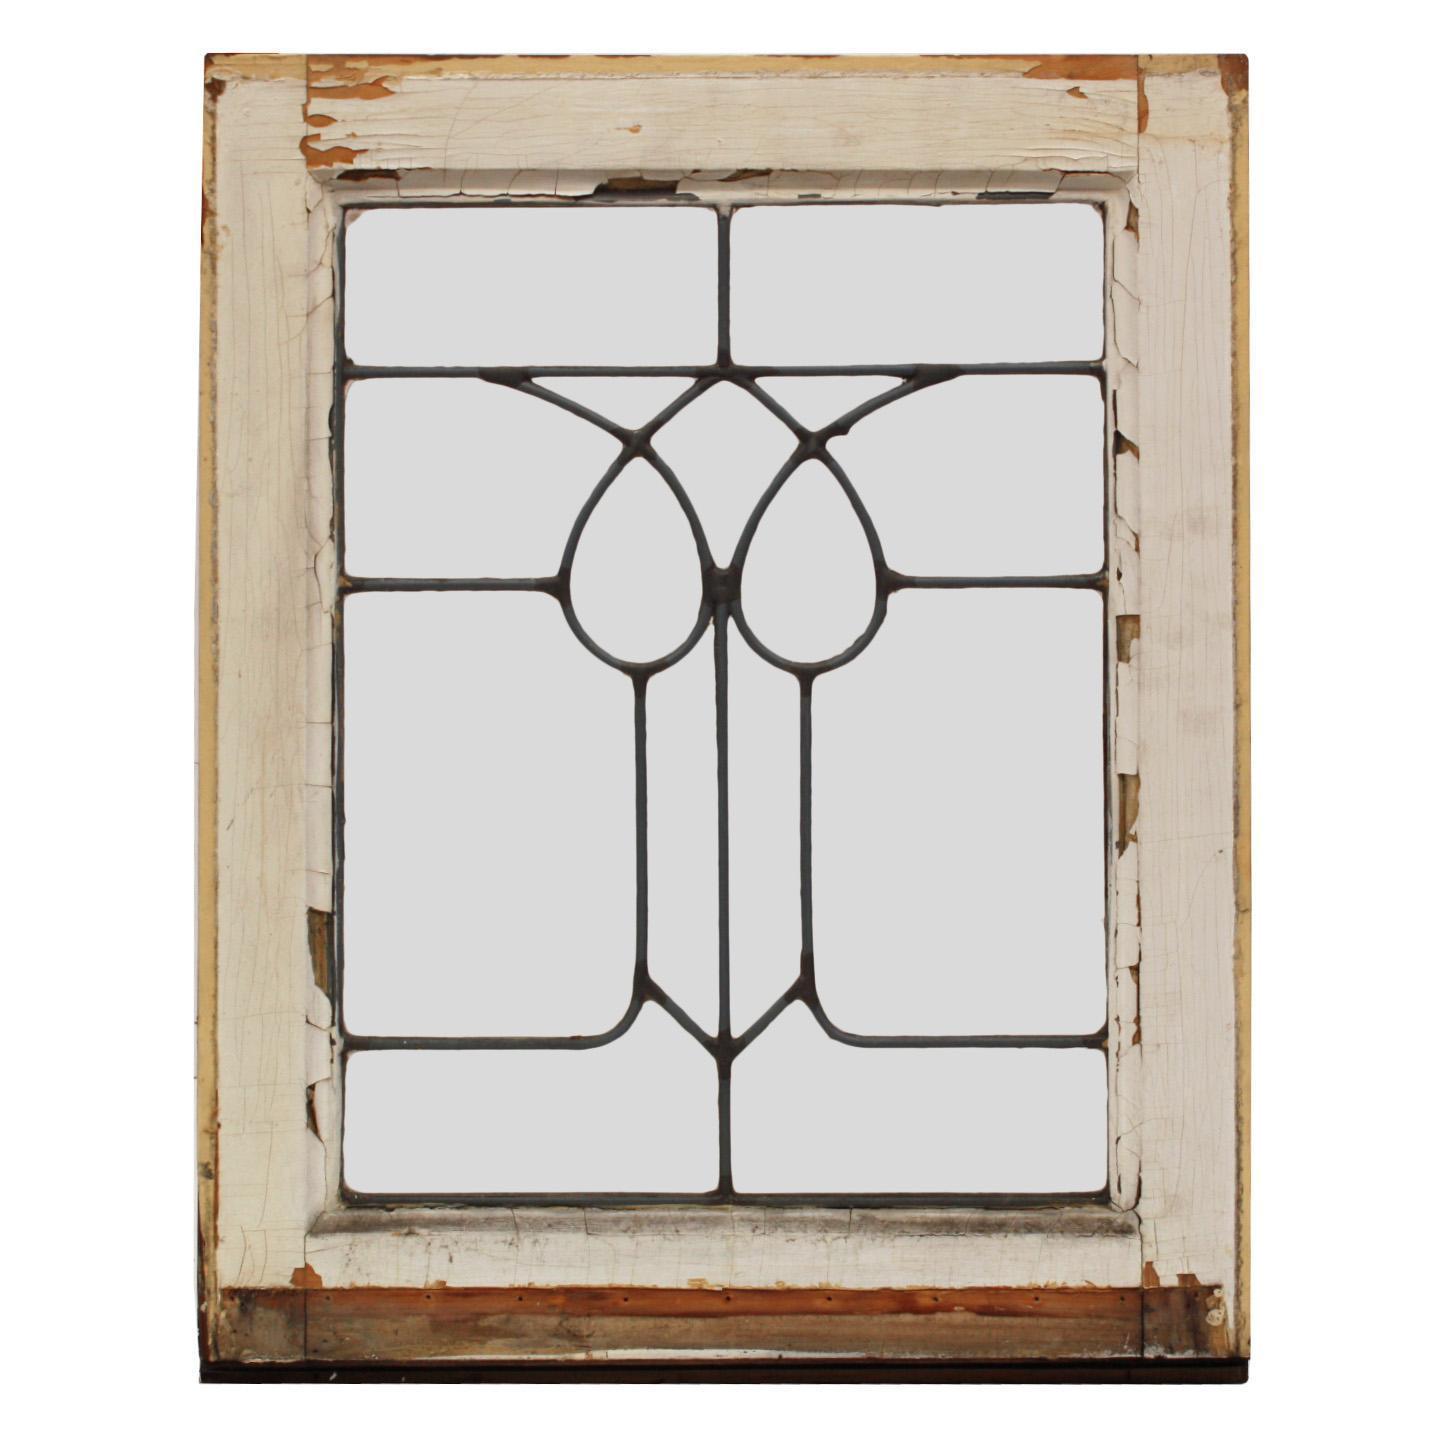 Lovely Antique American Leaded Glass Windows, Stylized Flower